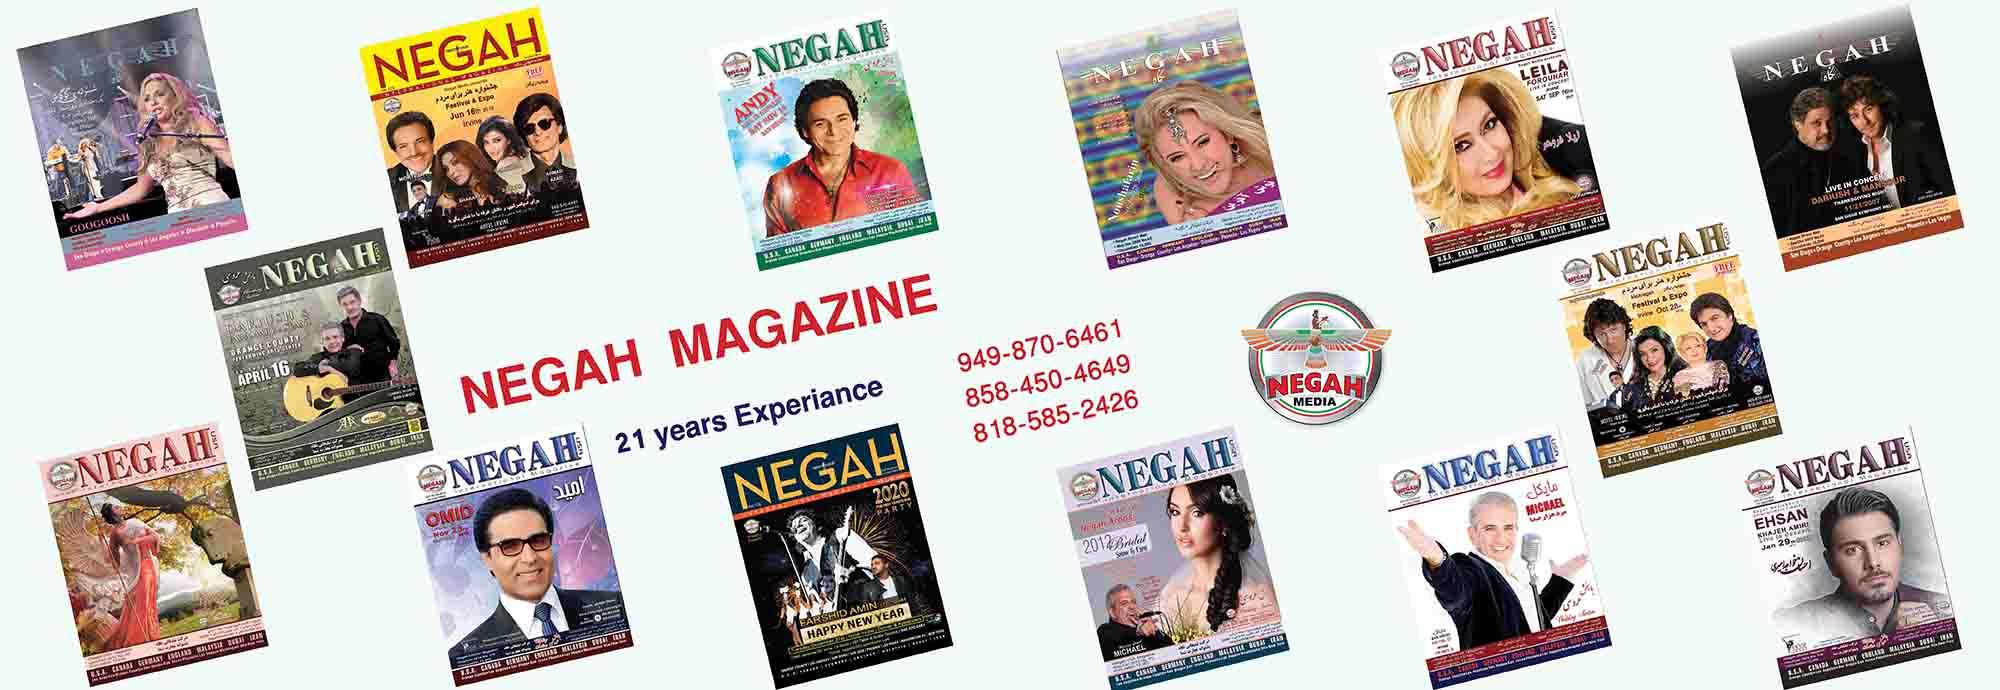 2-Negah Magazine Marketv Negah website 2000x690 ff